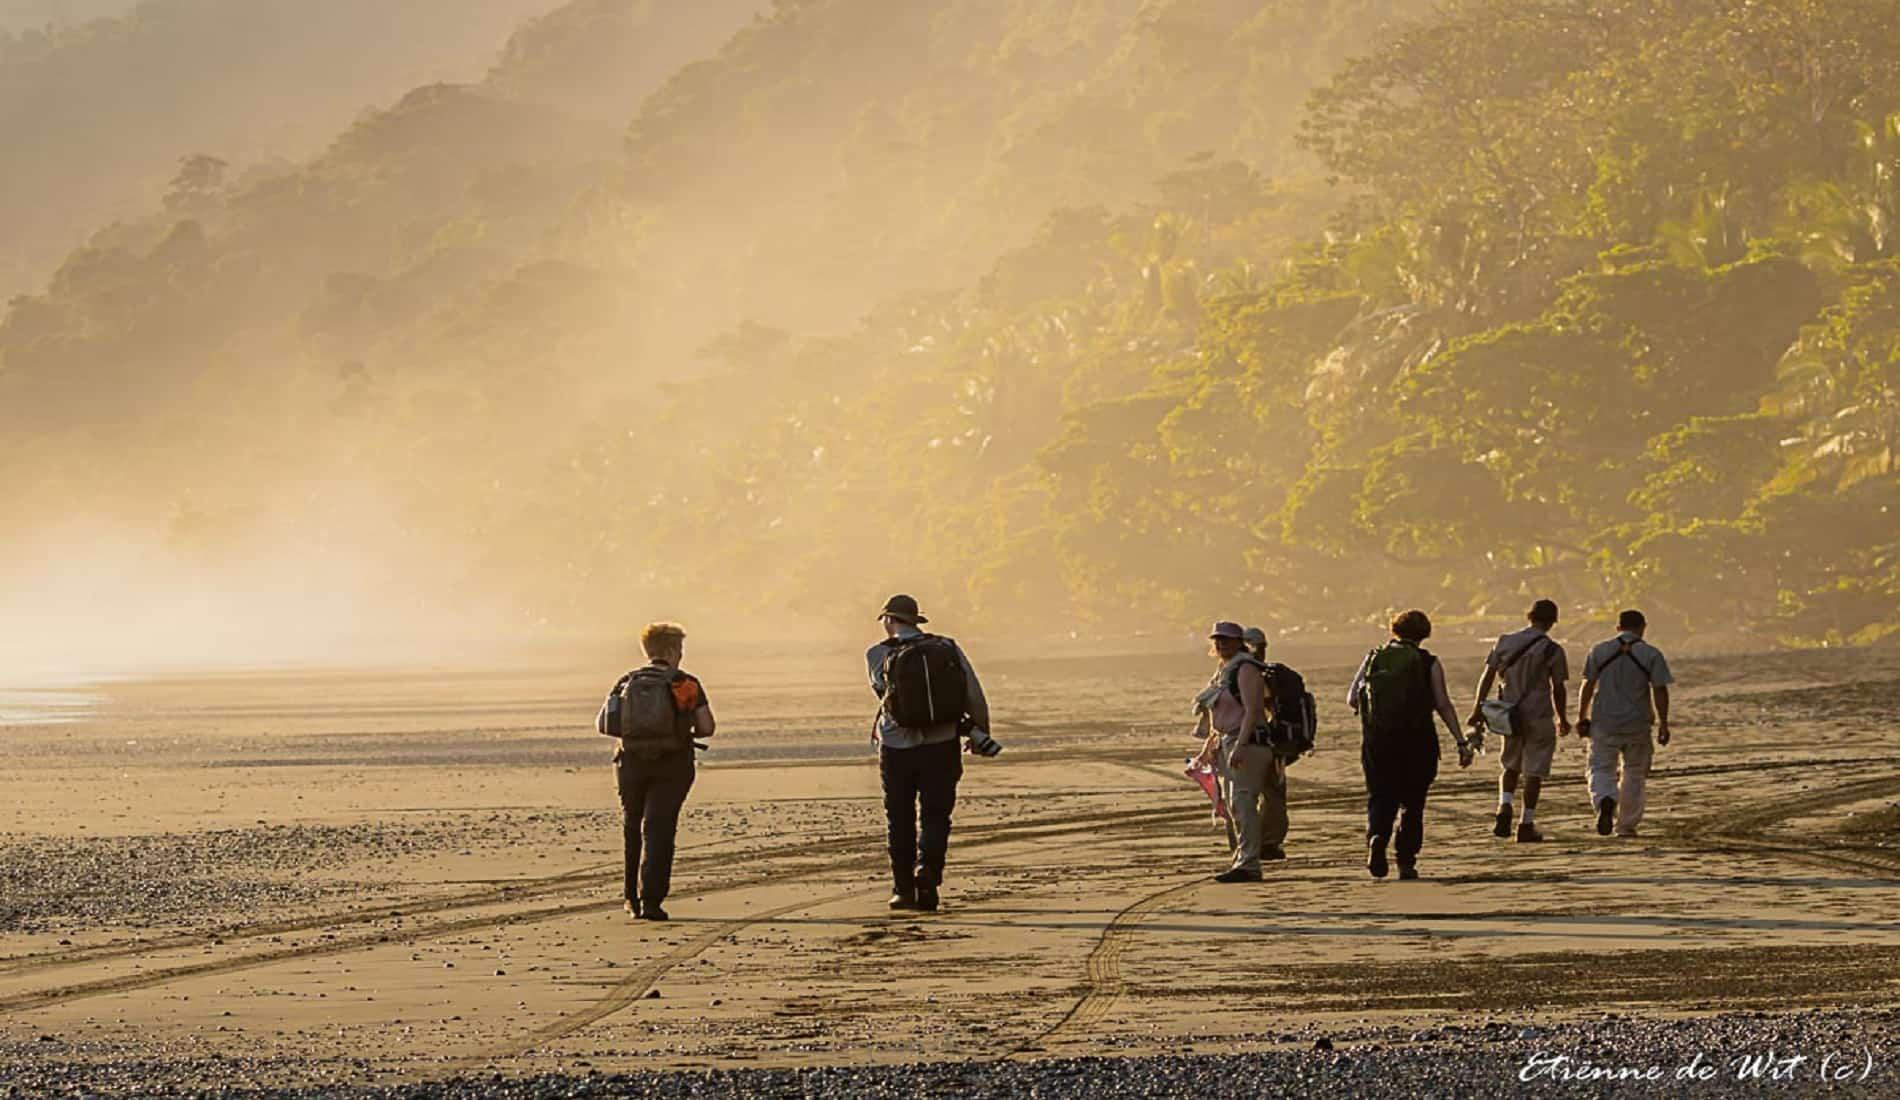 Corcovado groep fotoreis costa rica Nationaal Park Corcovado Etienne de Wit